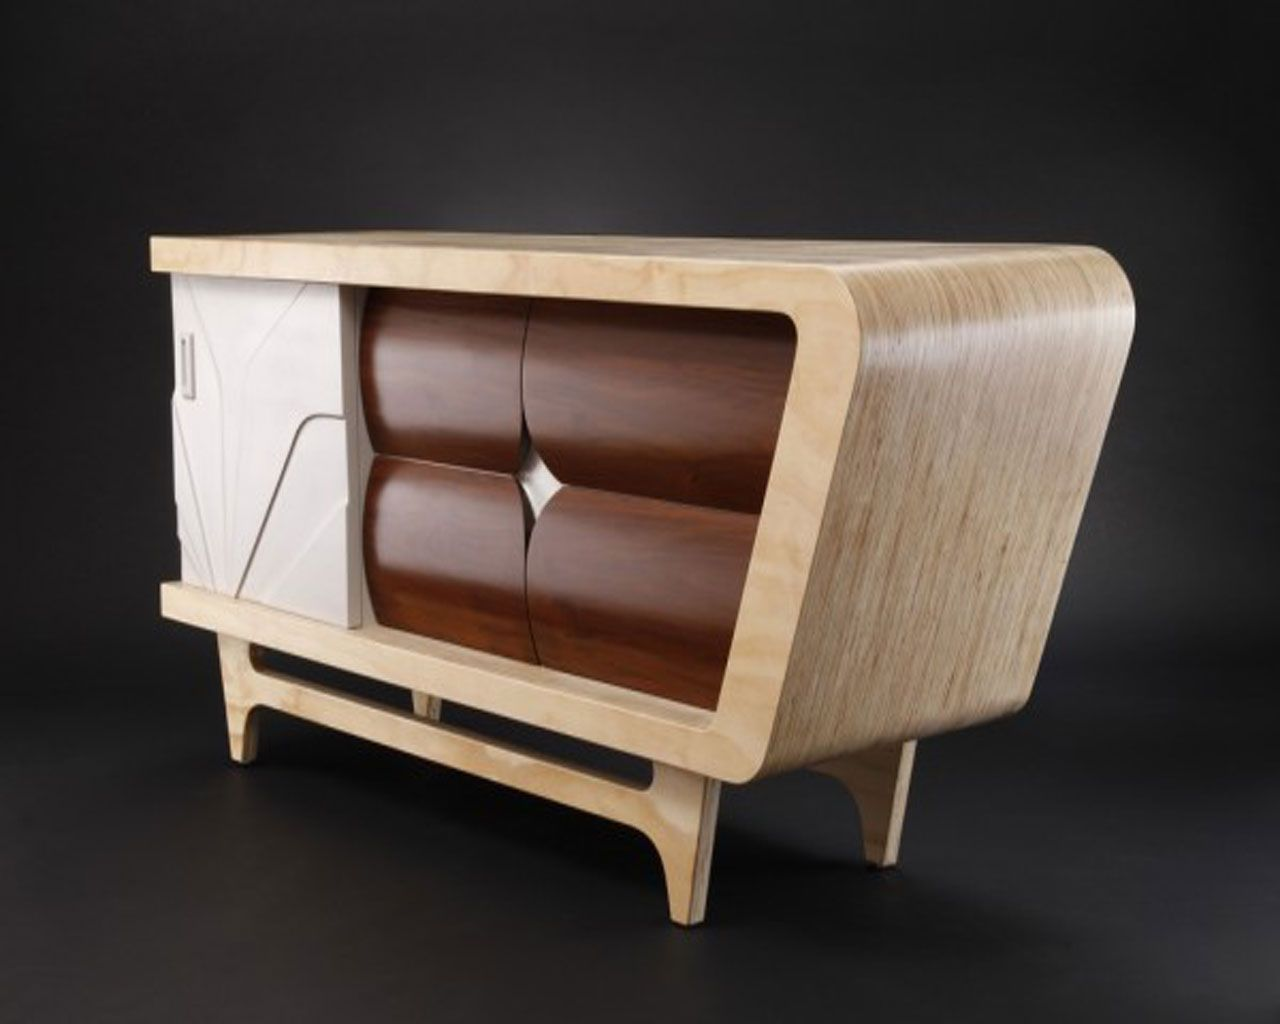 Retro Credenza Jory Brigham Modern Jory Brigham Furniture Cases Pinterest